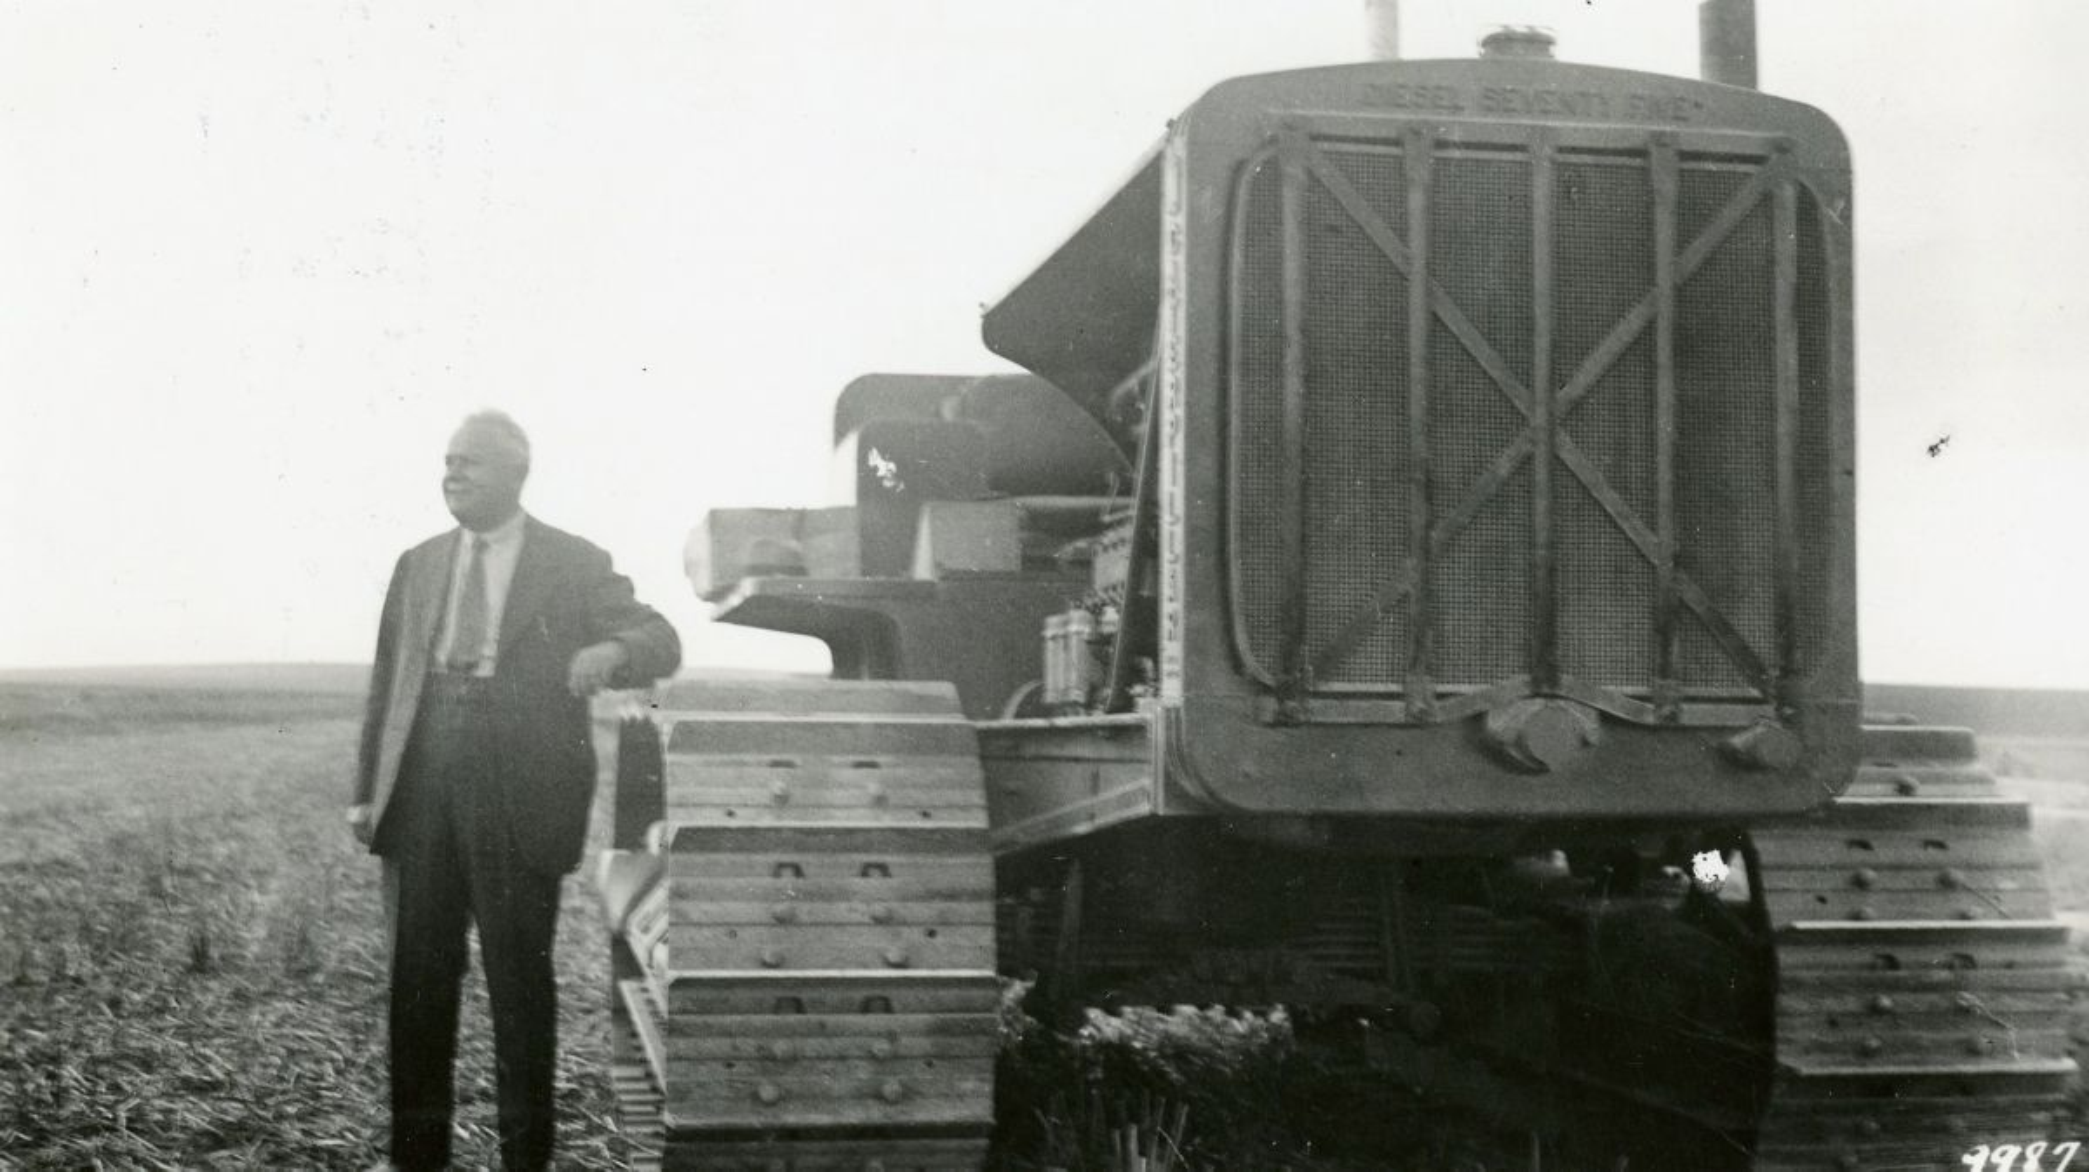 Primer tractor diésel Caterpillar vendido en África, 1933.